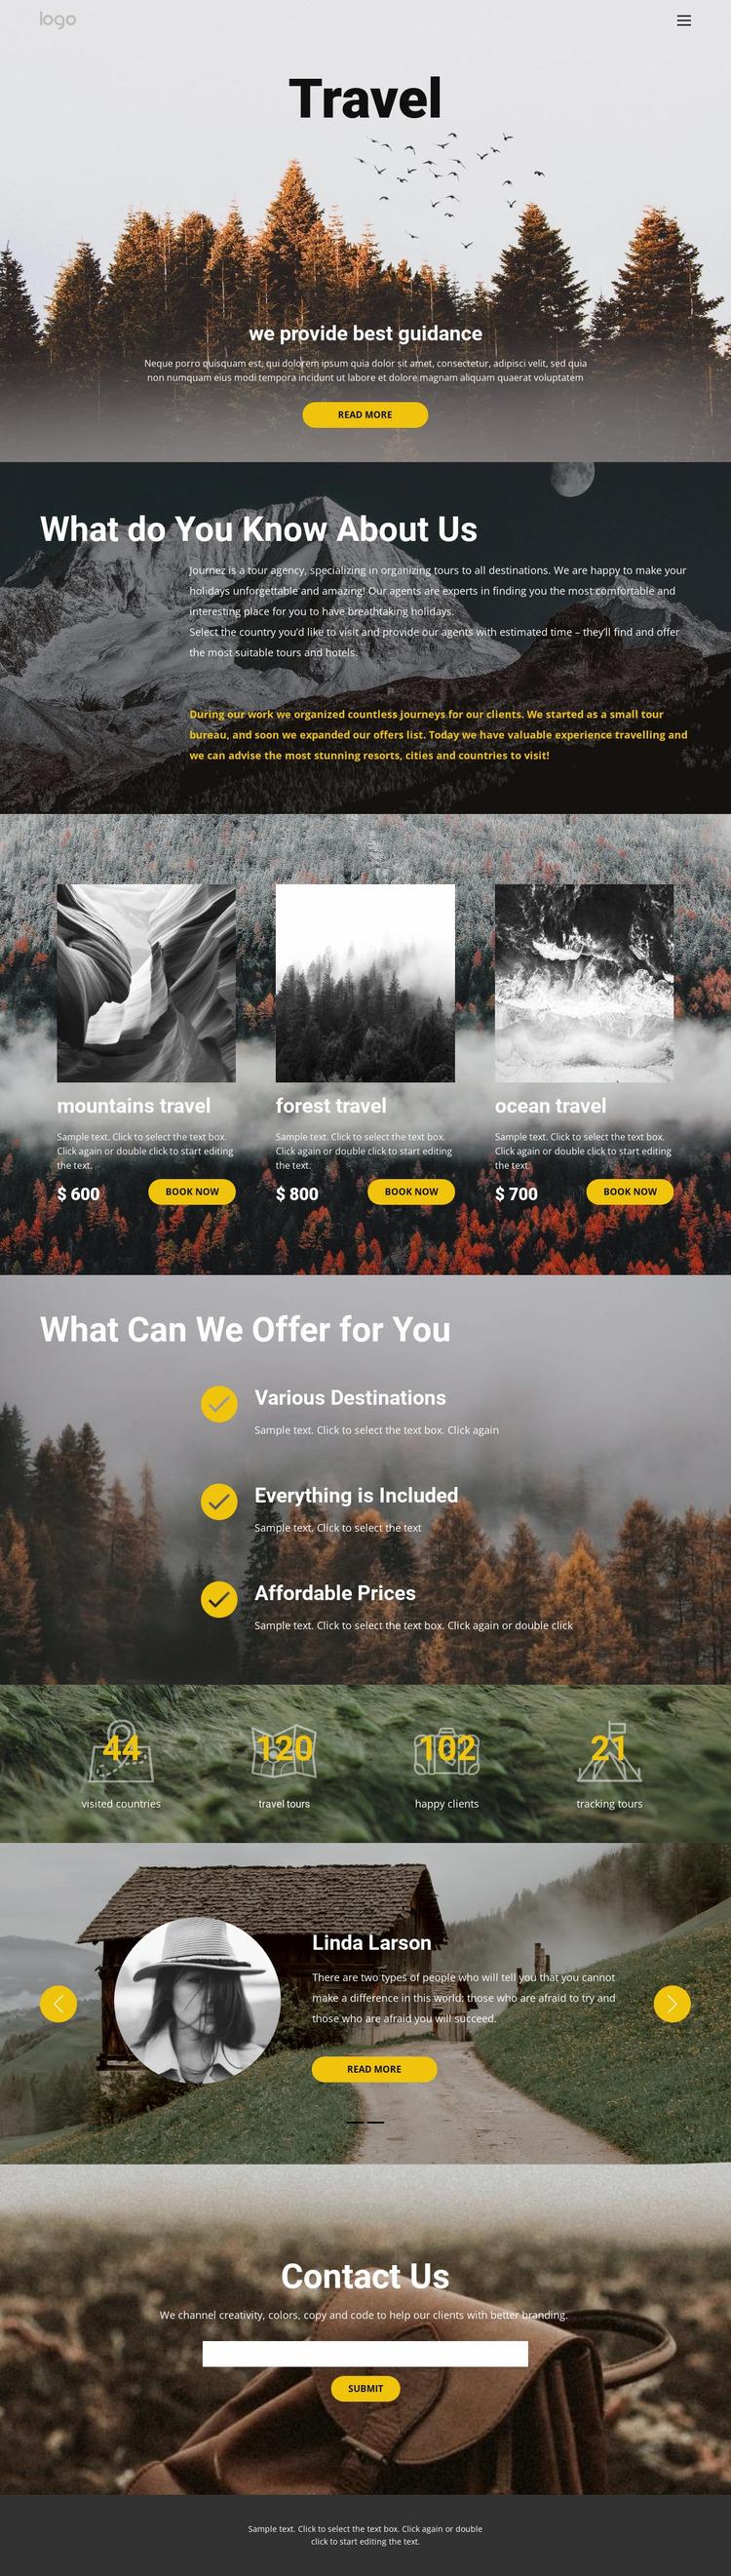 Wild solo travel Website Mockup